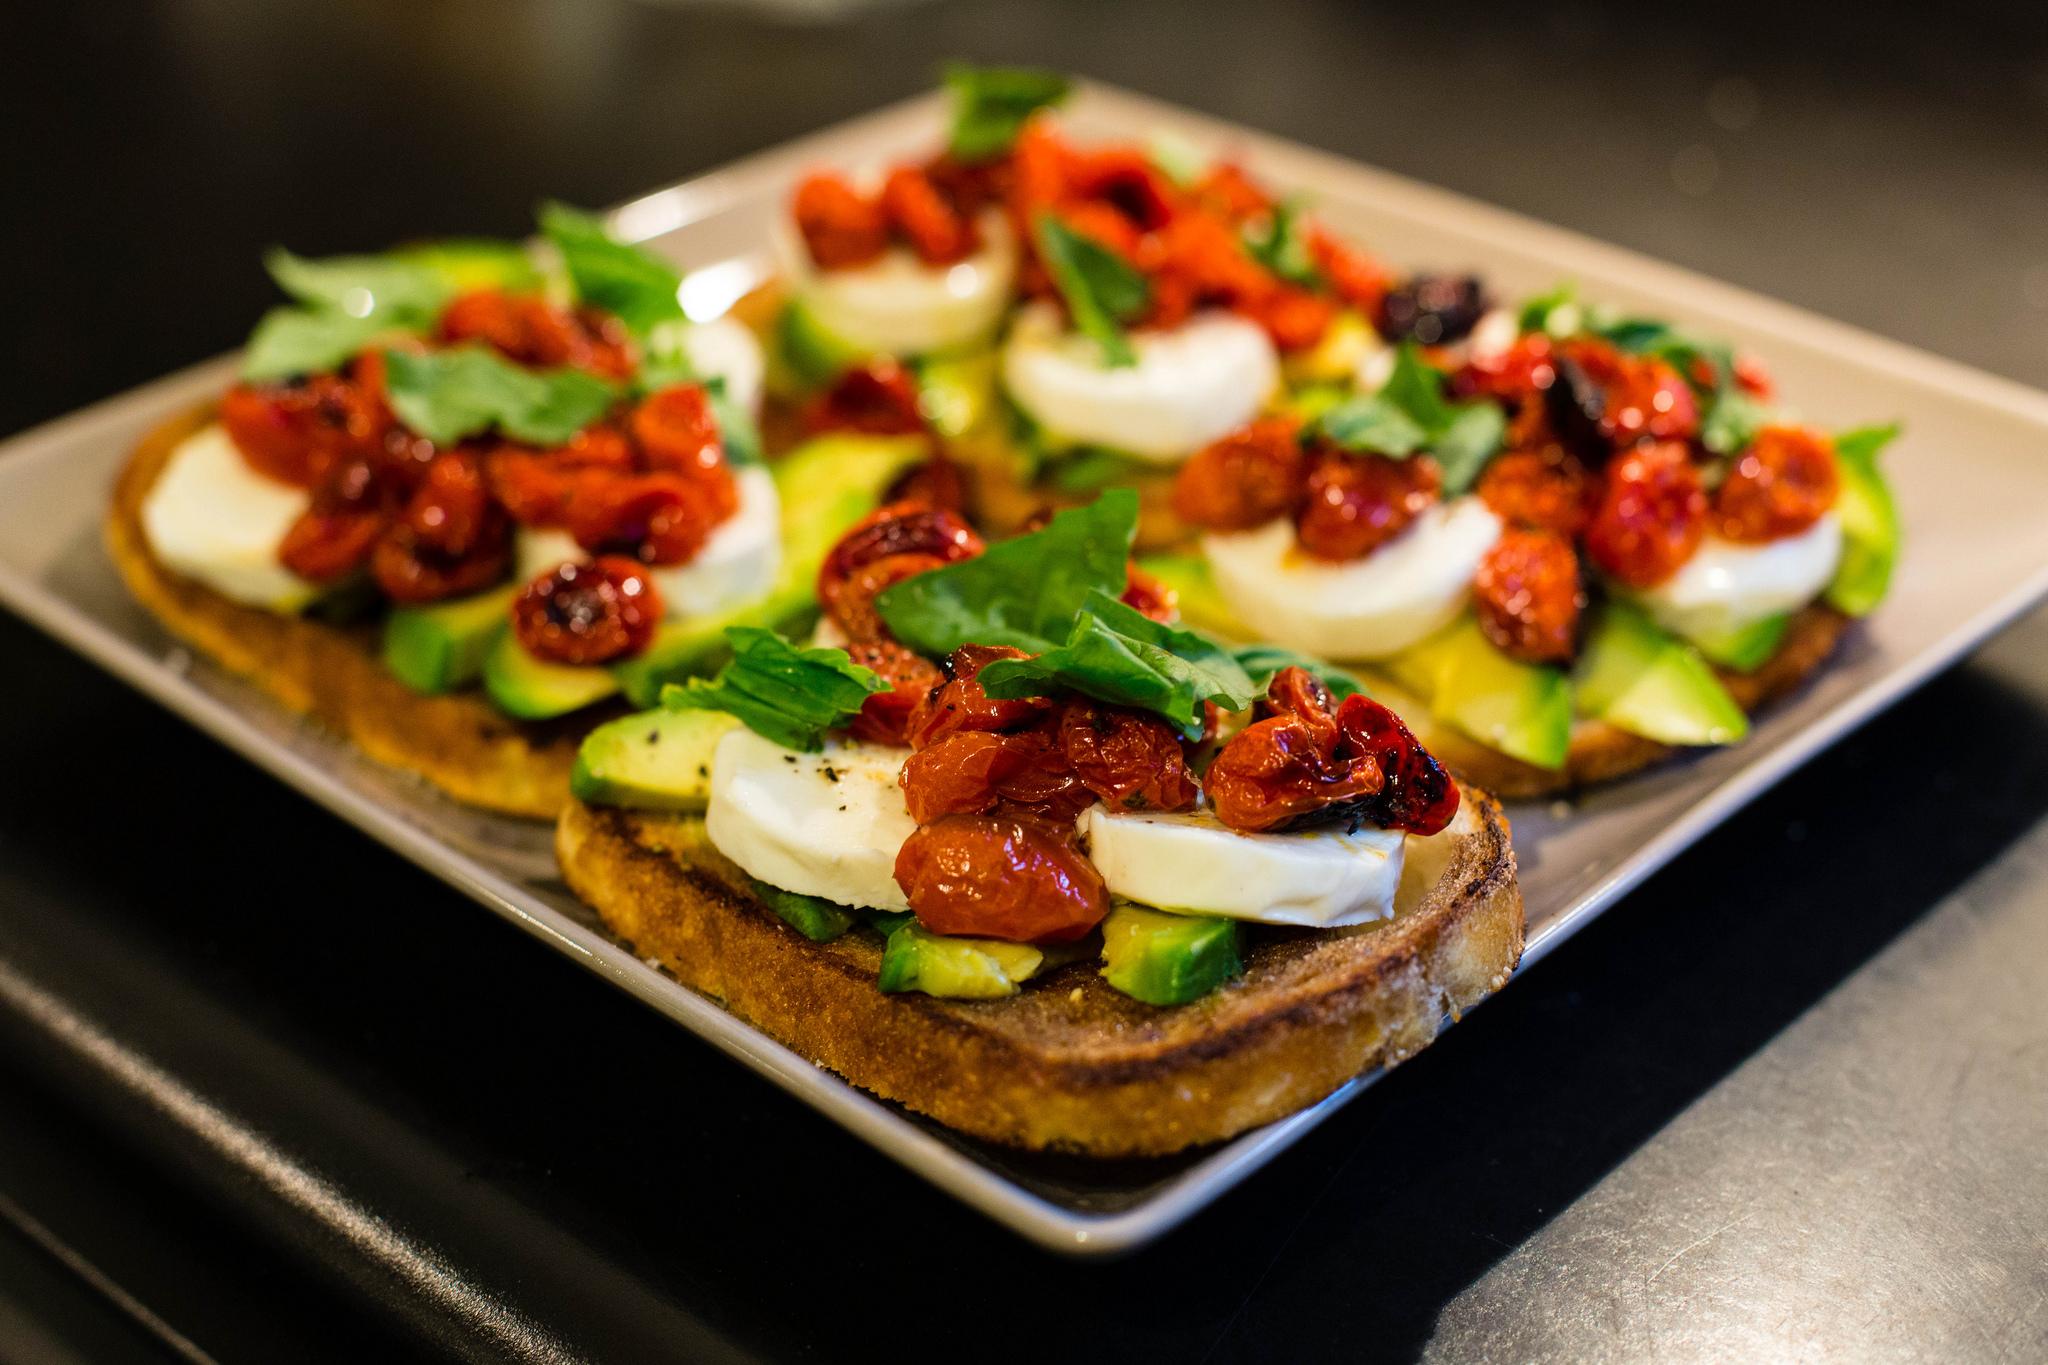 Best Vegetarian Restaurants In Saskatoon